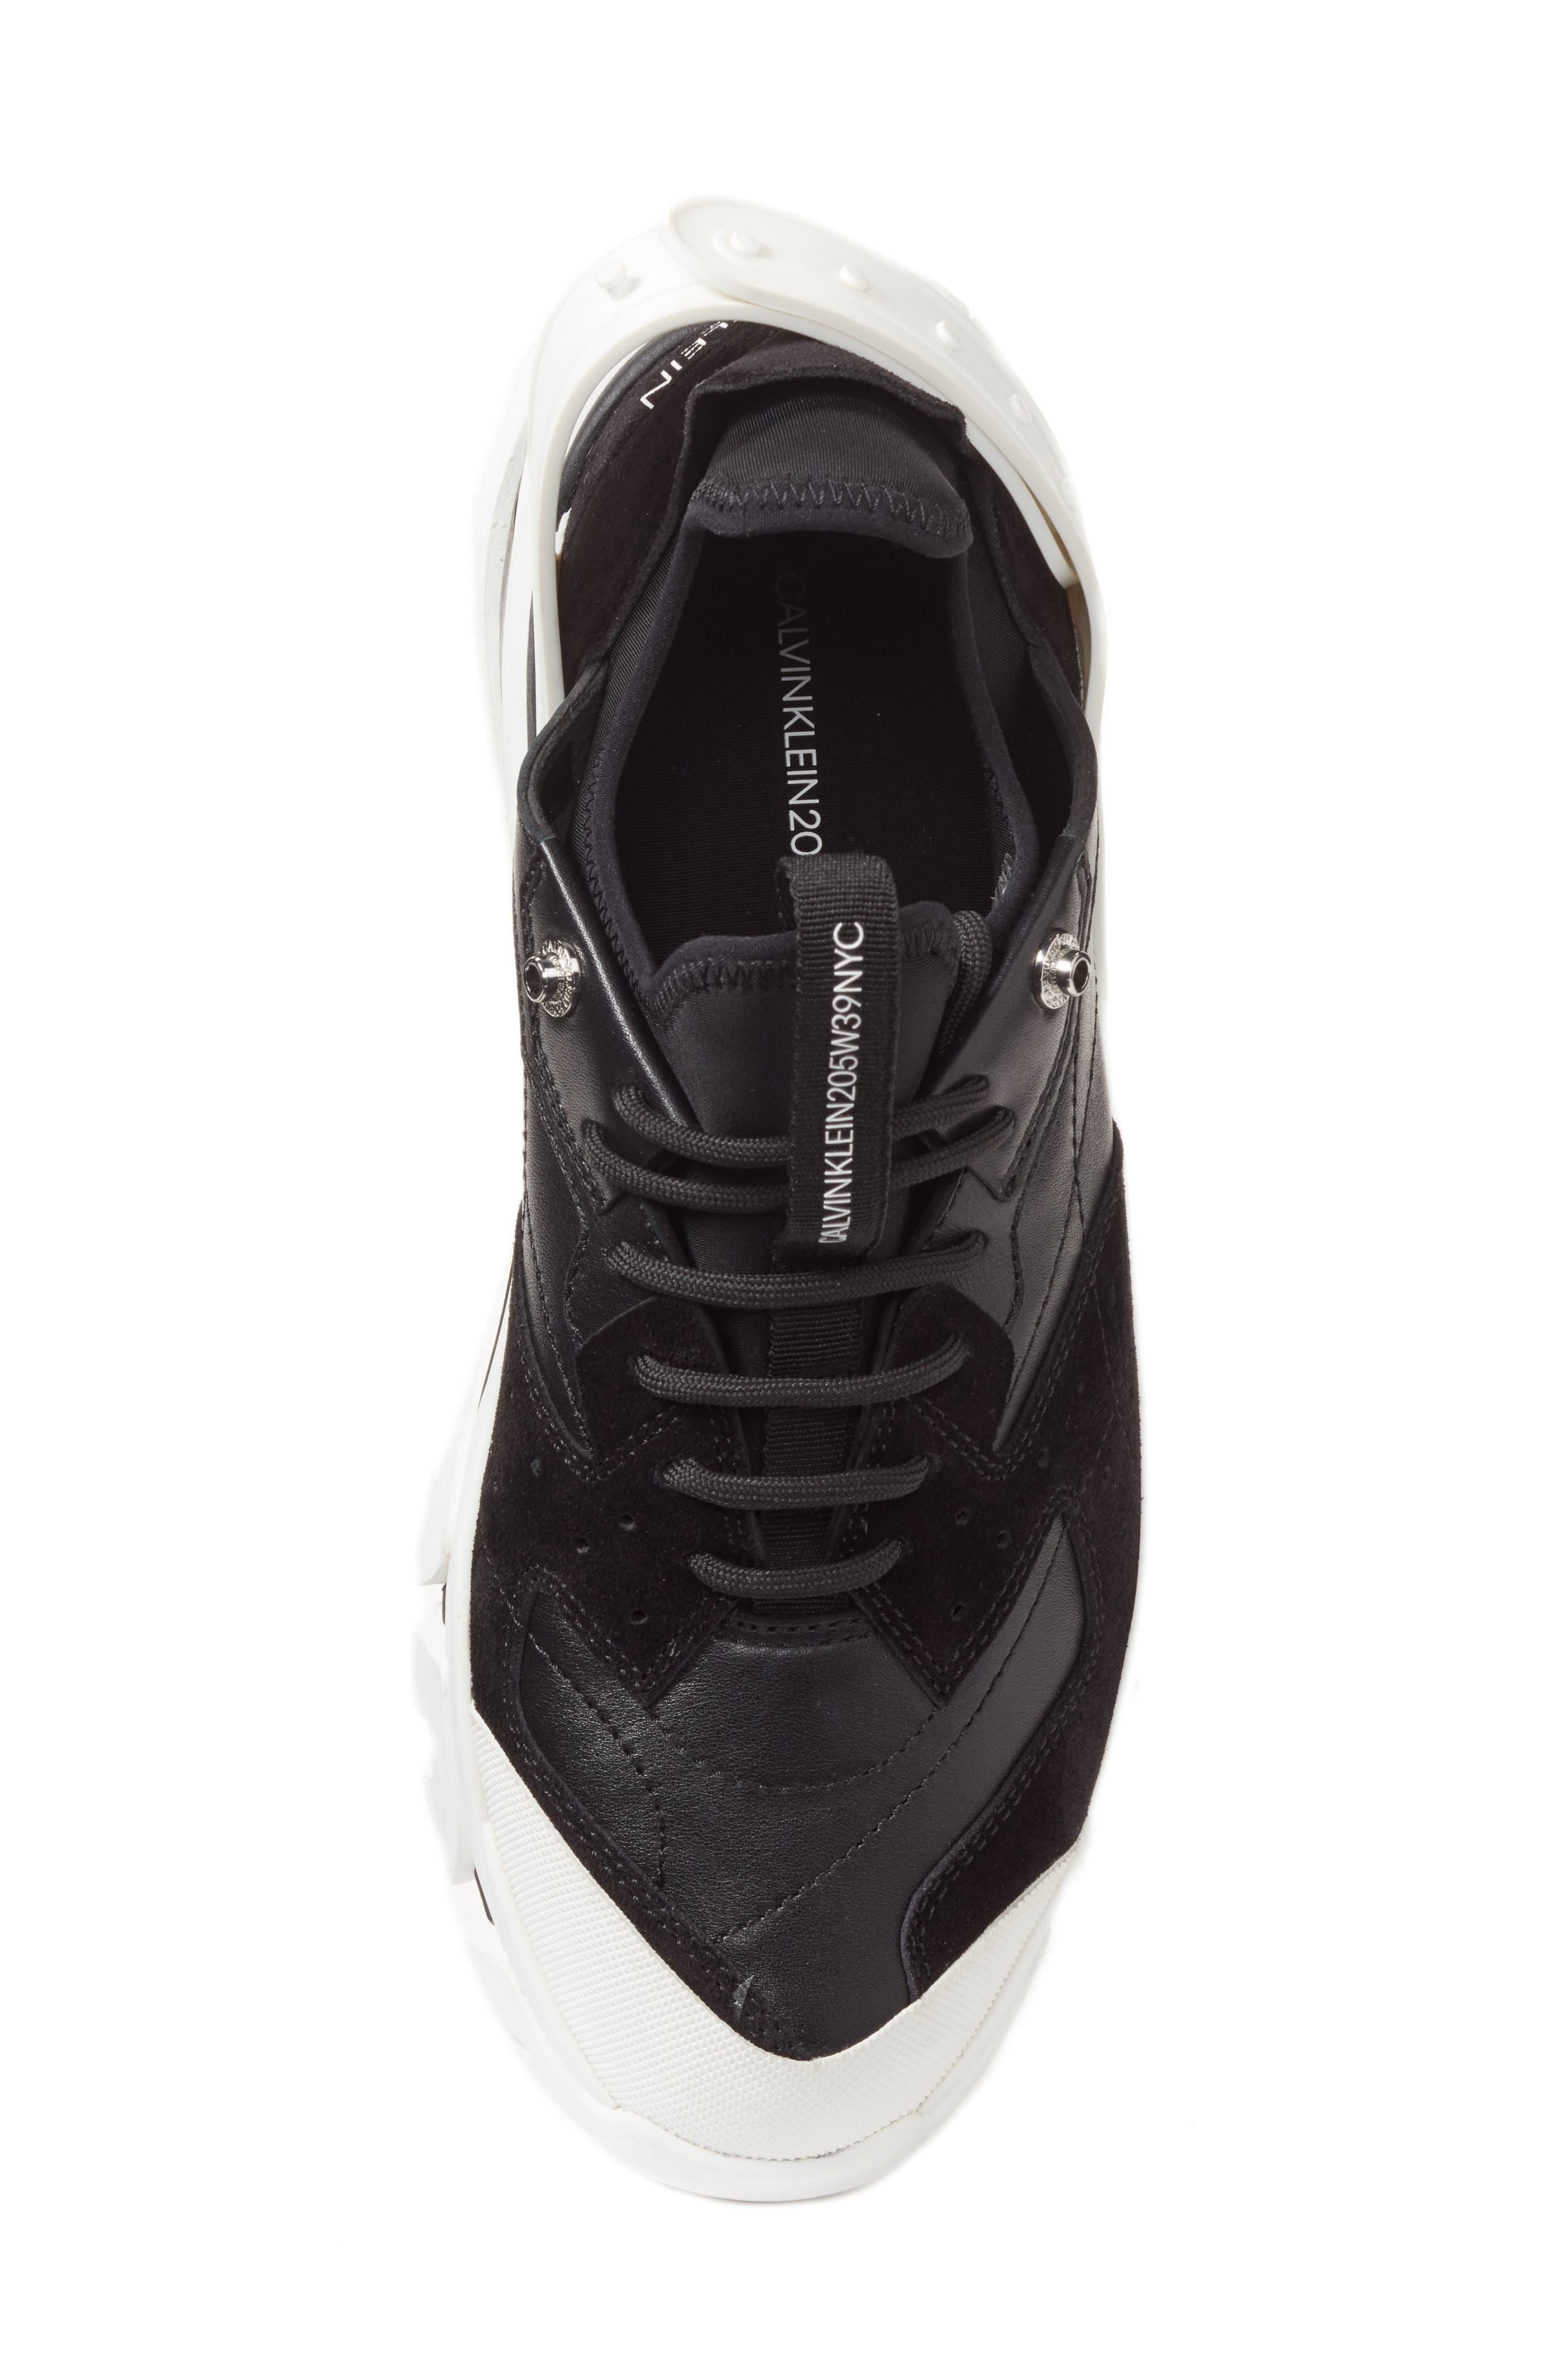 205W39NYC Carla Sneaker,                             Alternate thumbnail 5, color,                             WHITE/ BLACK